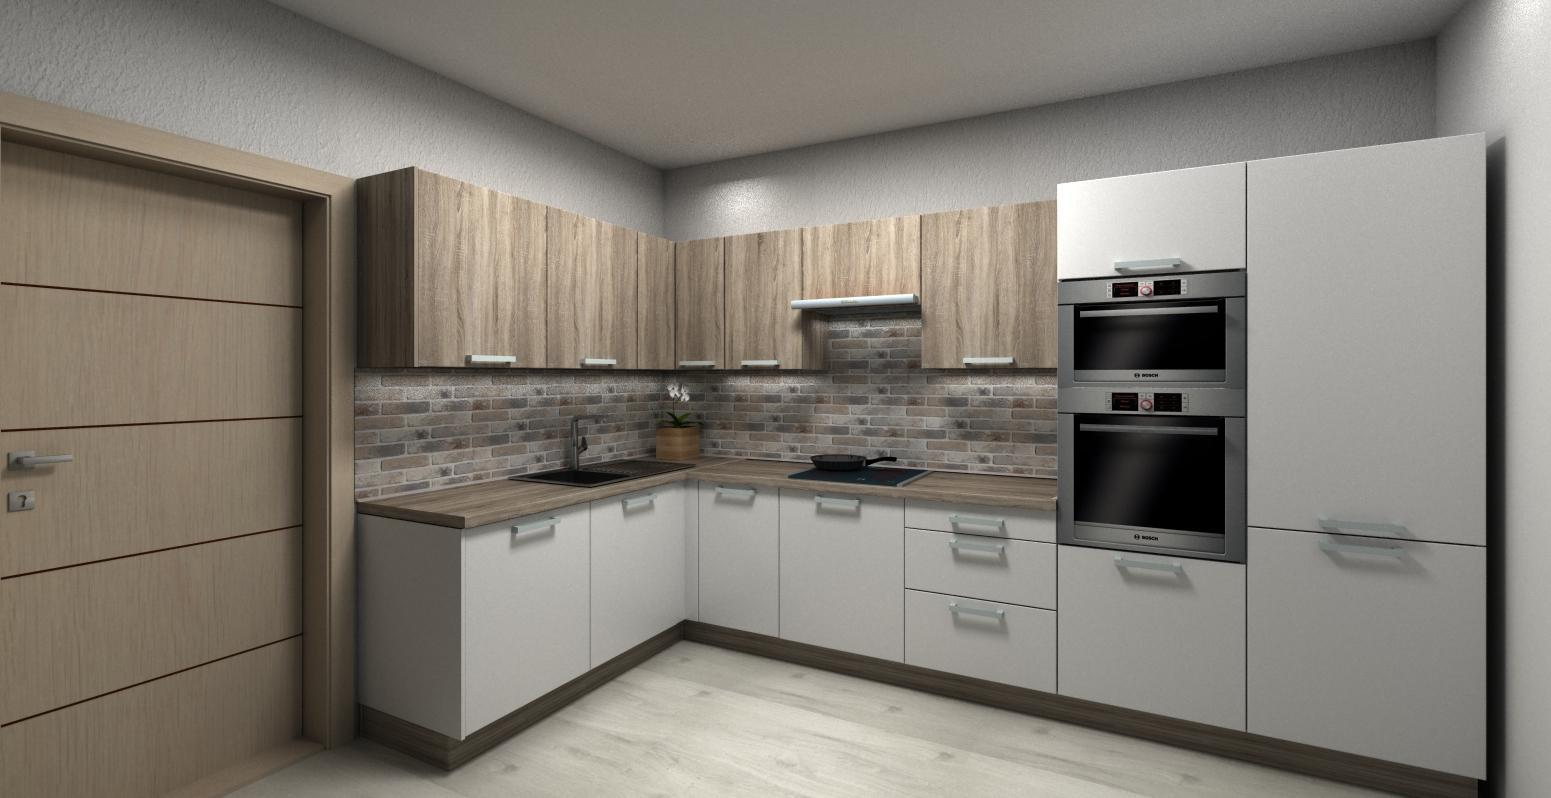 Kuchyne - Obrázok č. 38